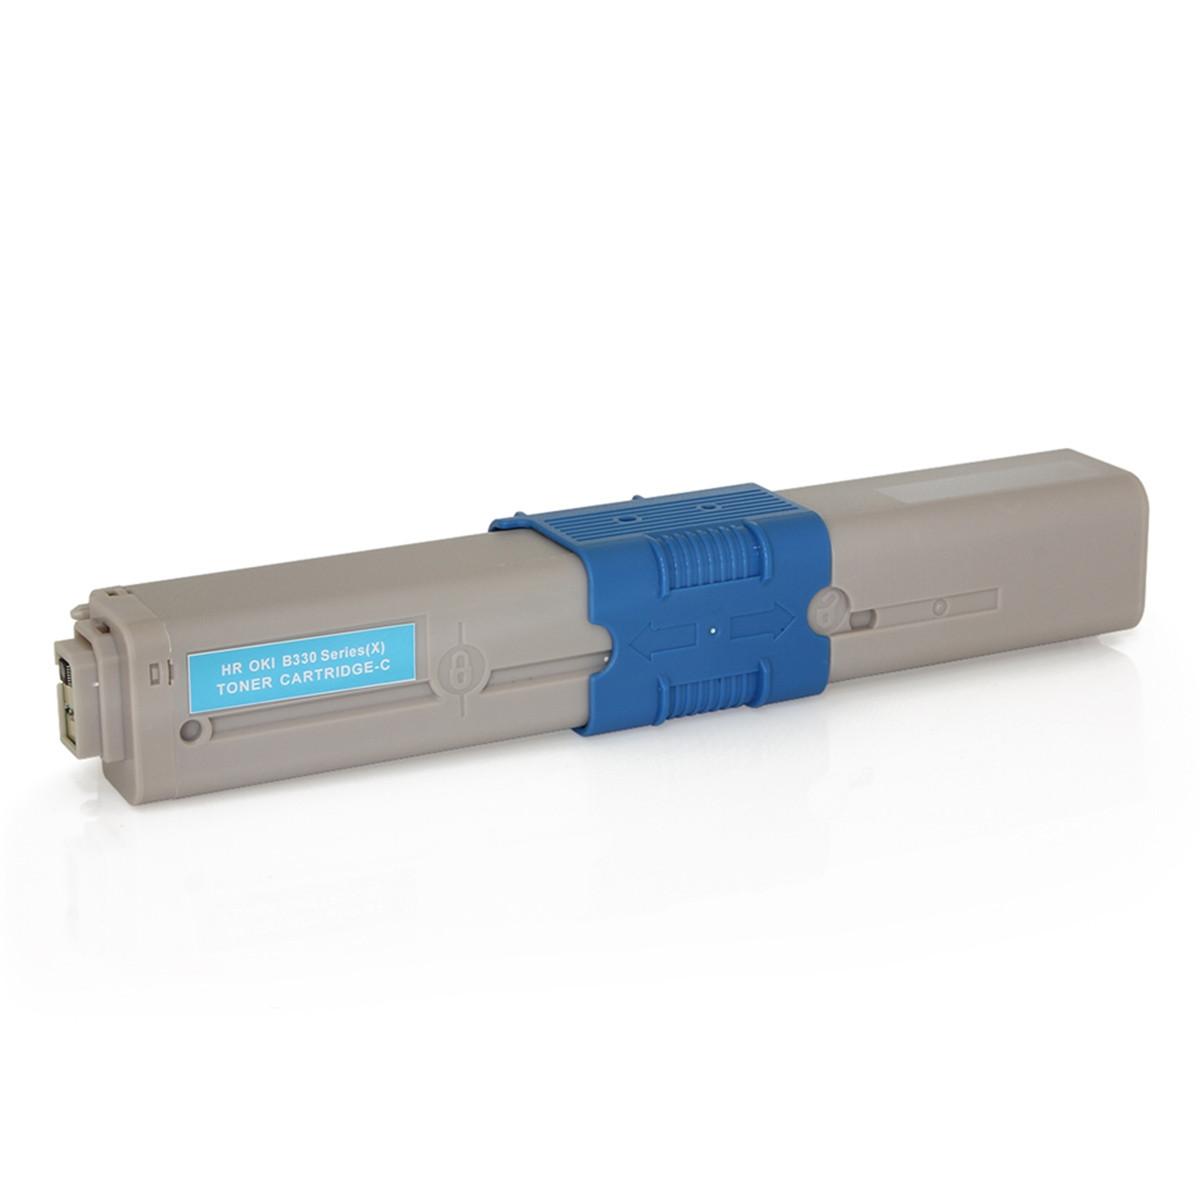 Toner Compatível Okidata 469706 469703 Ciano | C310 MC351 C310N MC361DN C330 MC561 | Importado 2k